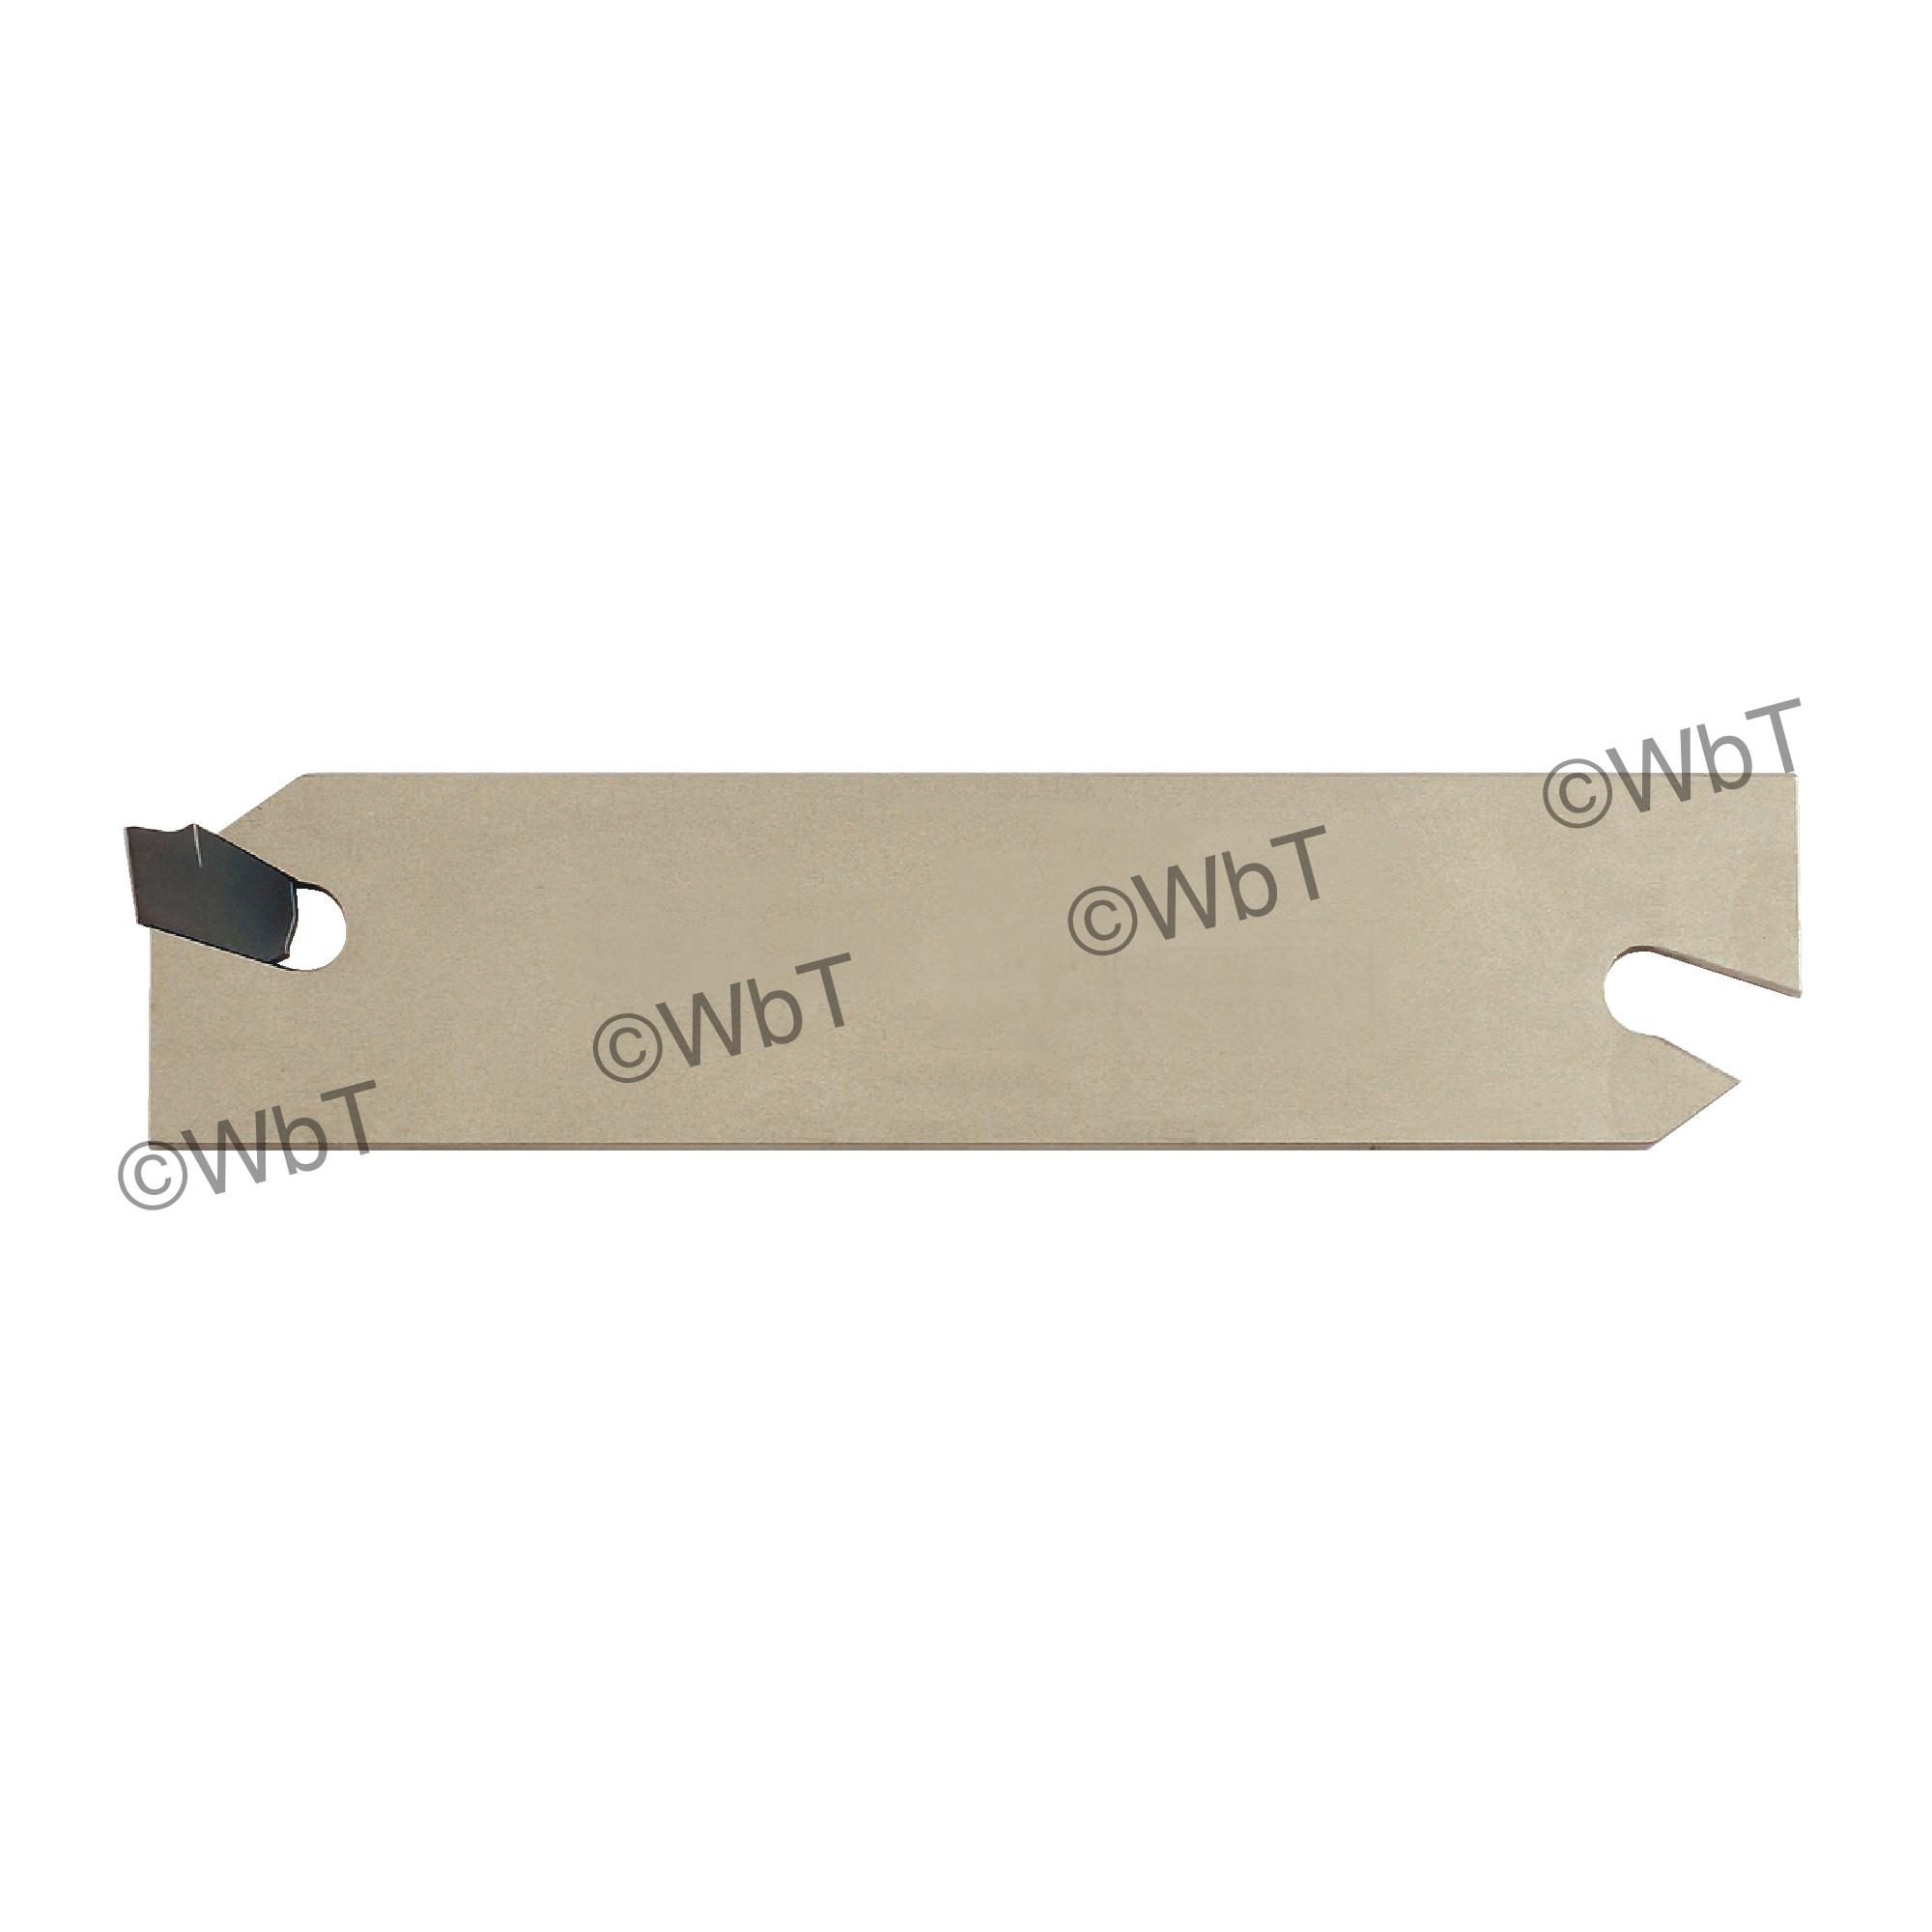 "ISCAR - SGIH 26-3 Parting Blade / GTN 3 Inserts / 1.00"" (26mm) Blade Height / NEUTRAL"